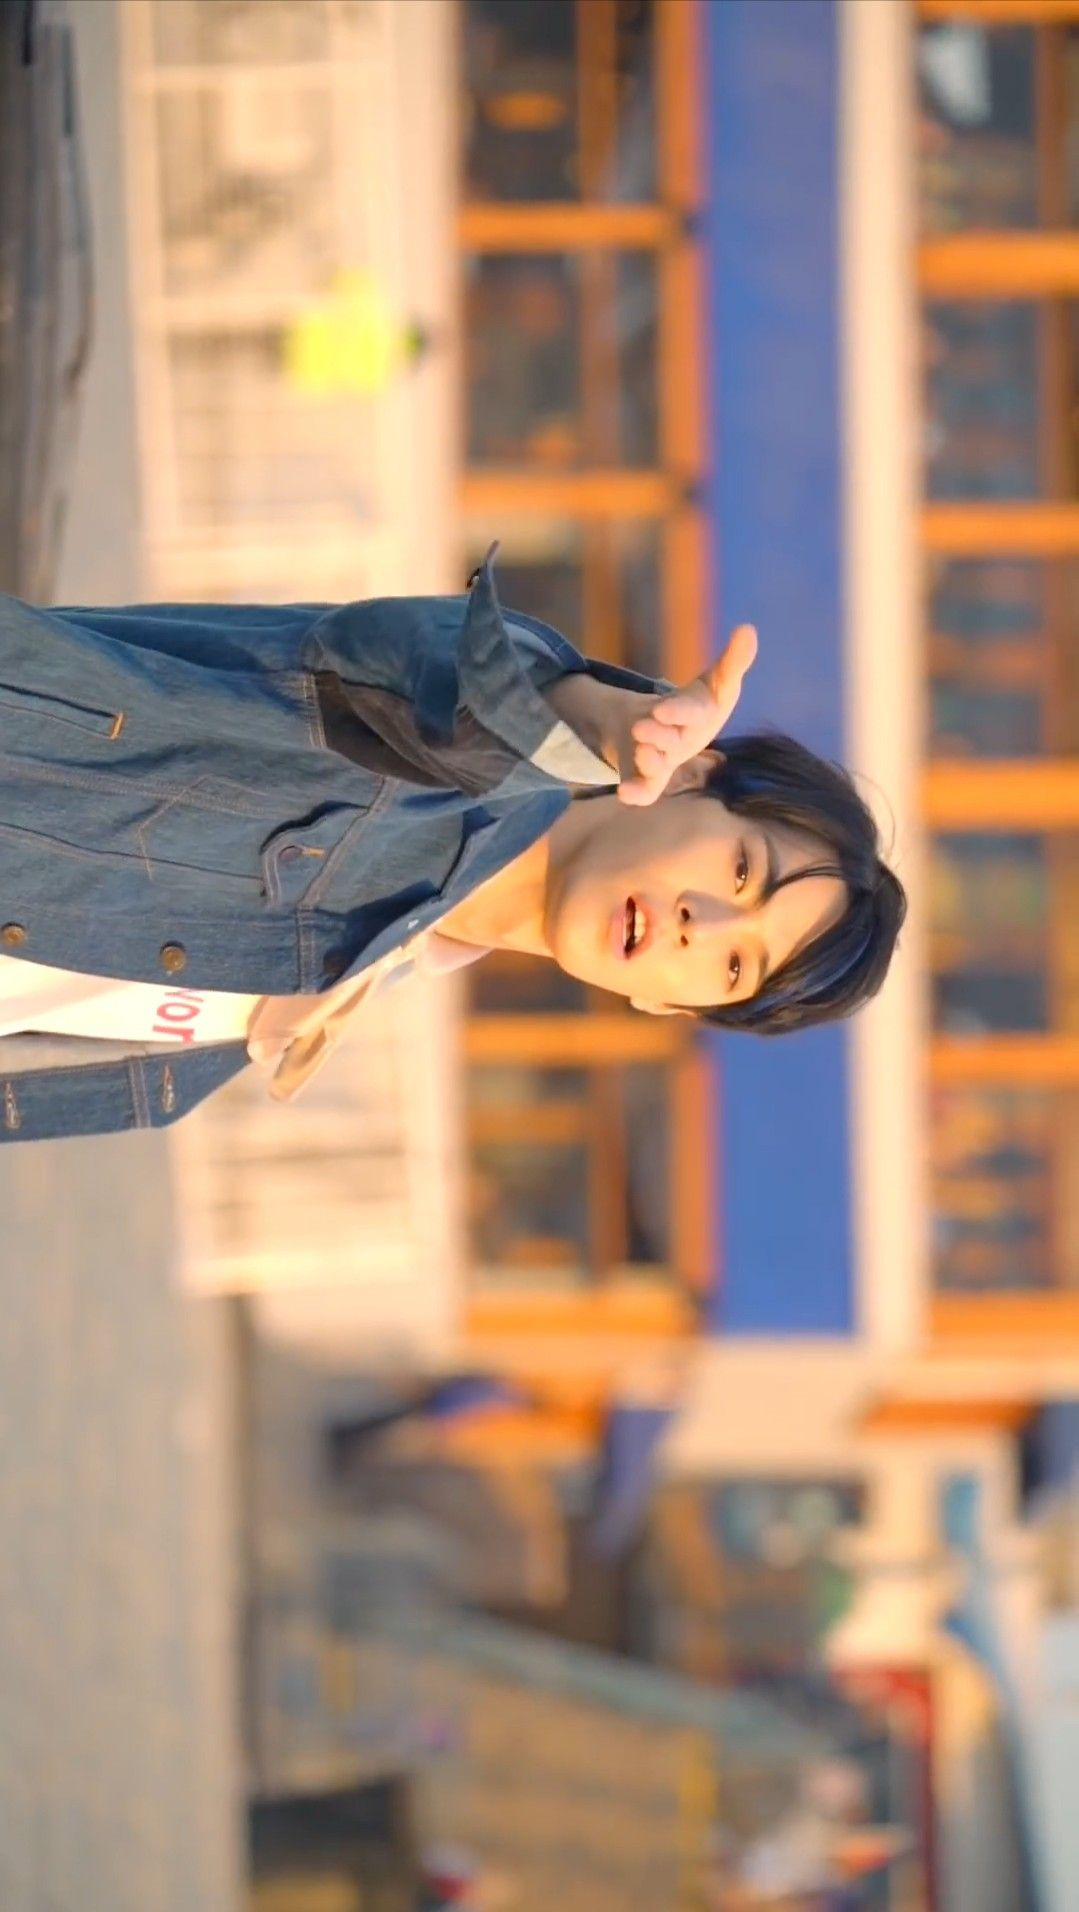 Doyoung Nct Nct127 Doyoung Nct Xiao Gambar